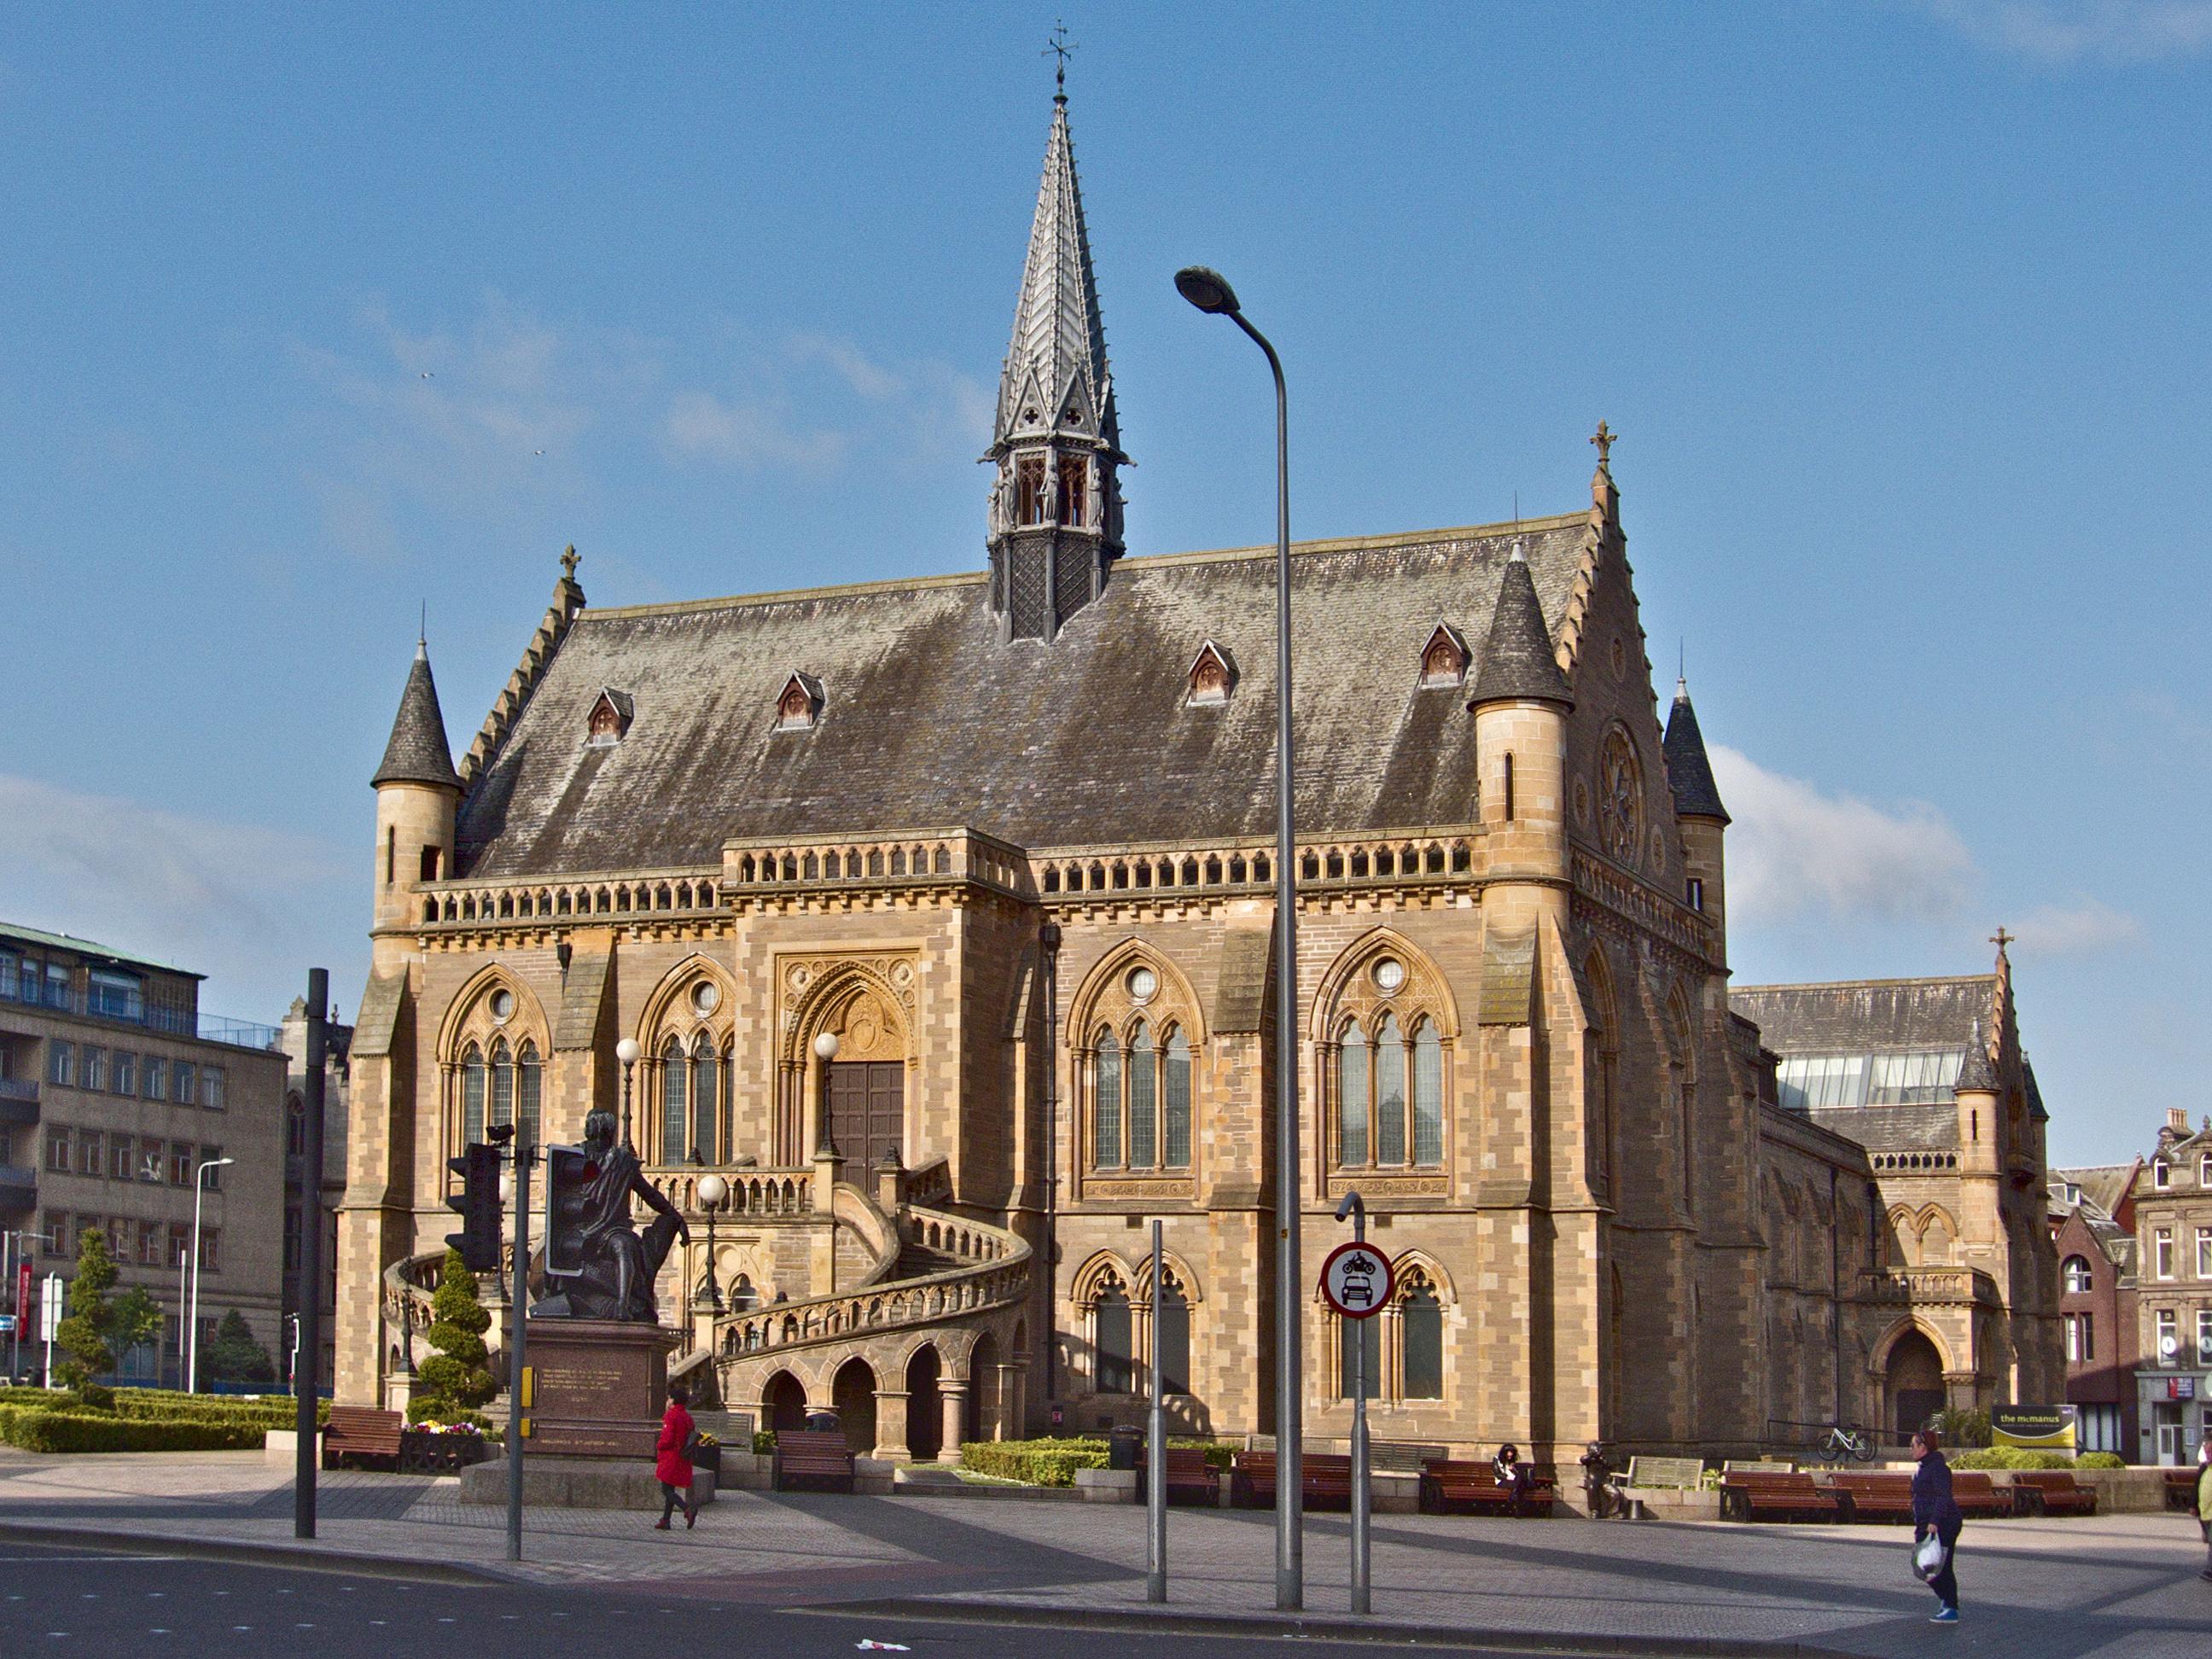 File:McManus Galleries Dundee 2017.jpg - Wikimedia Commons